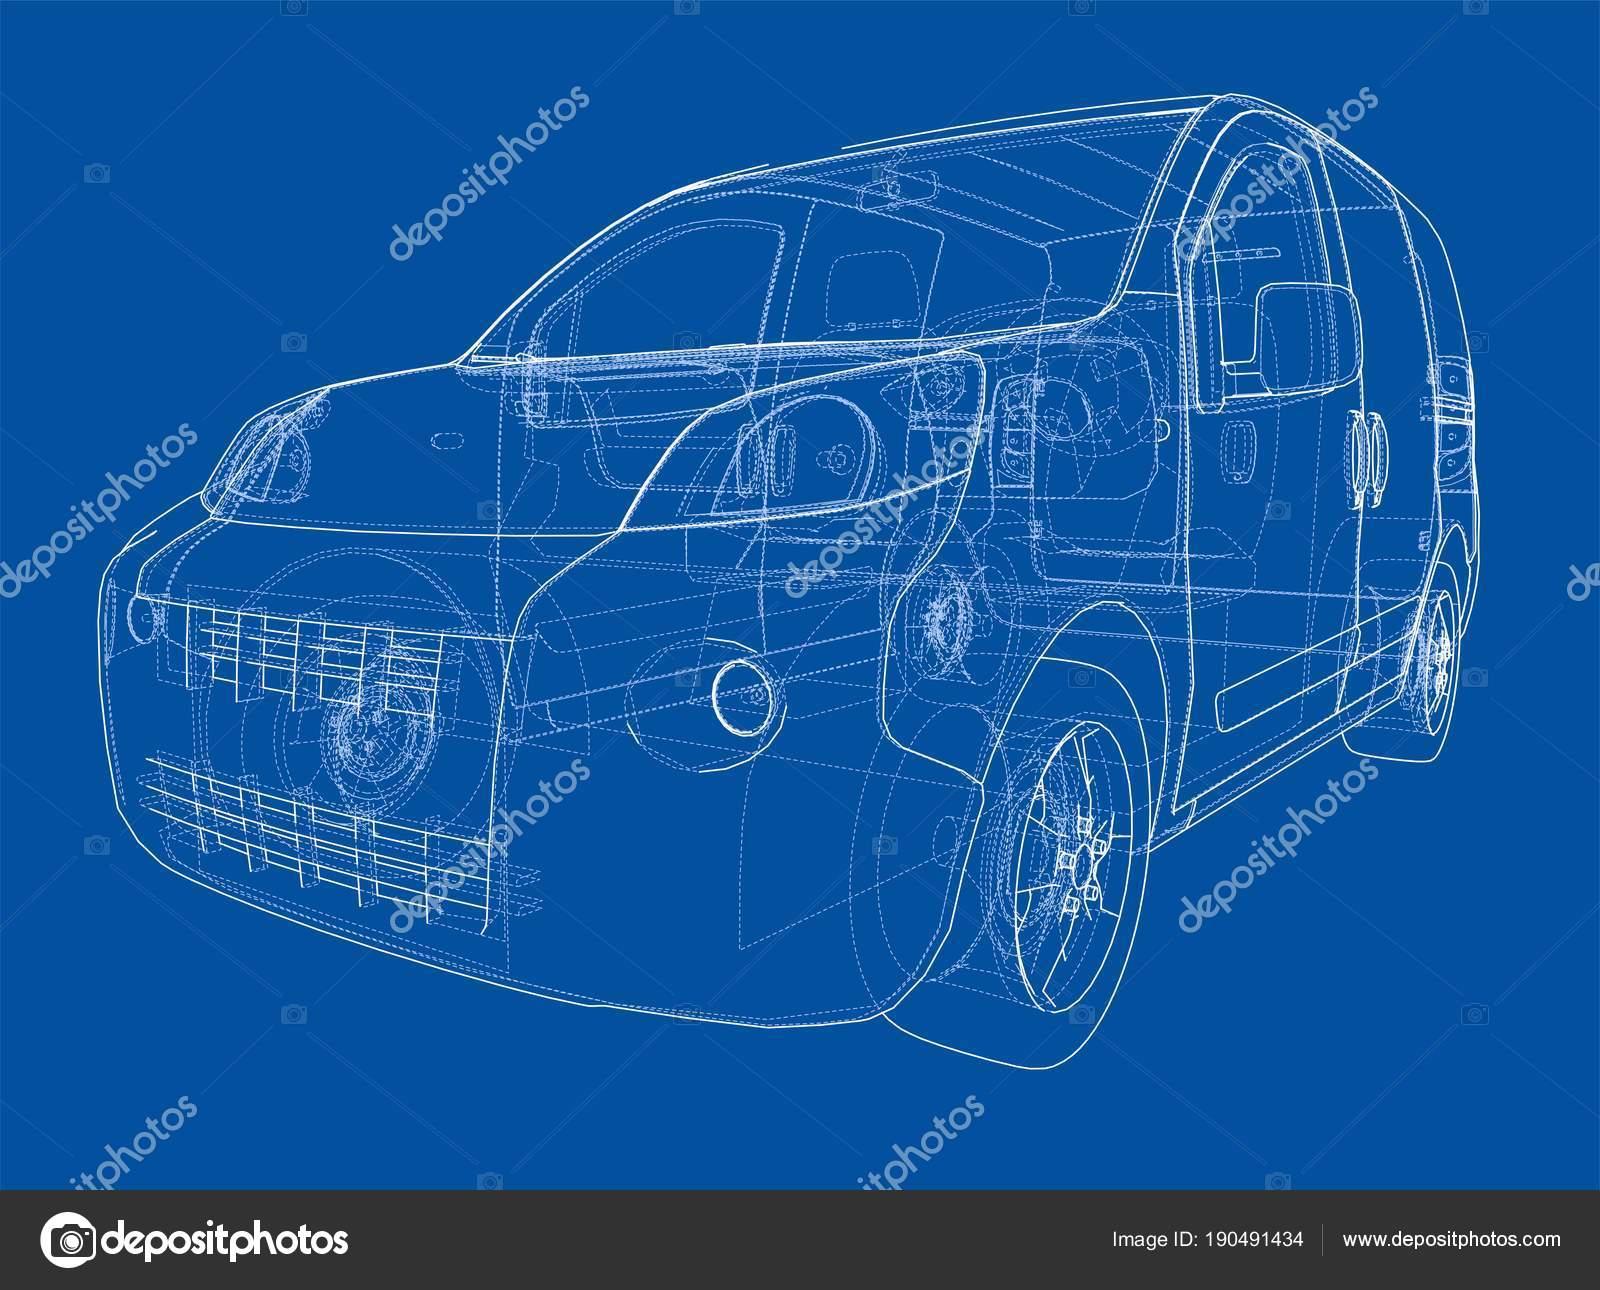 Concept car blueprint stock photo cherezoff 190491434 concept car blueprint stock photo malvernweather Image collections